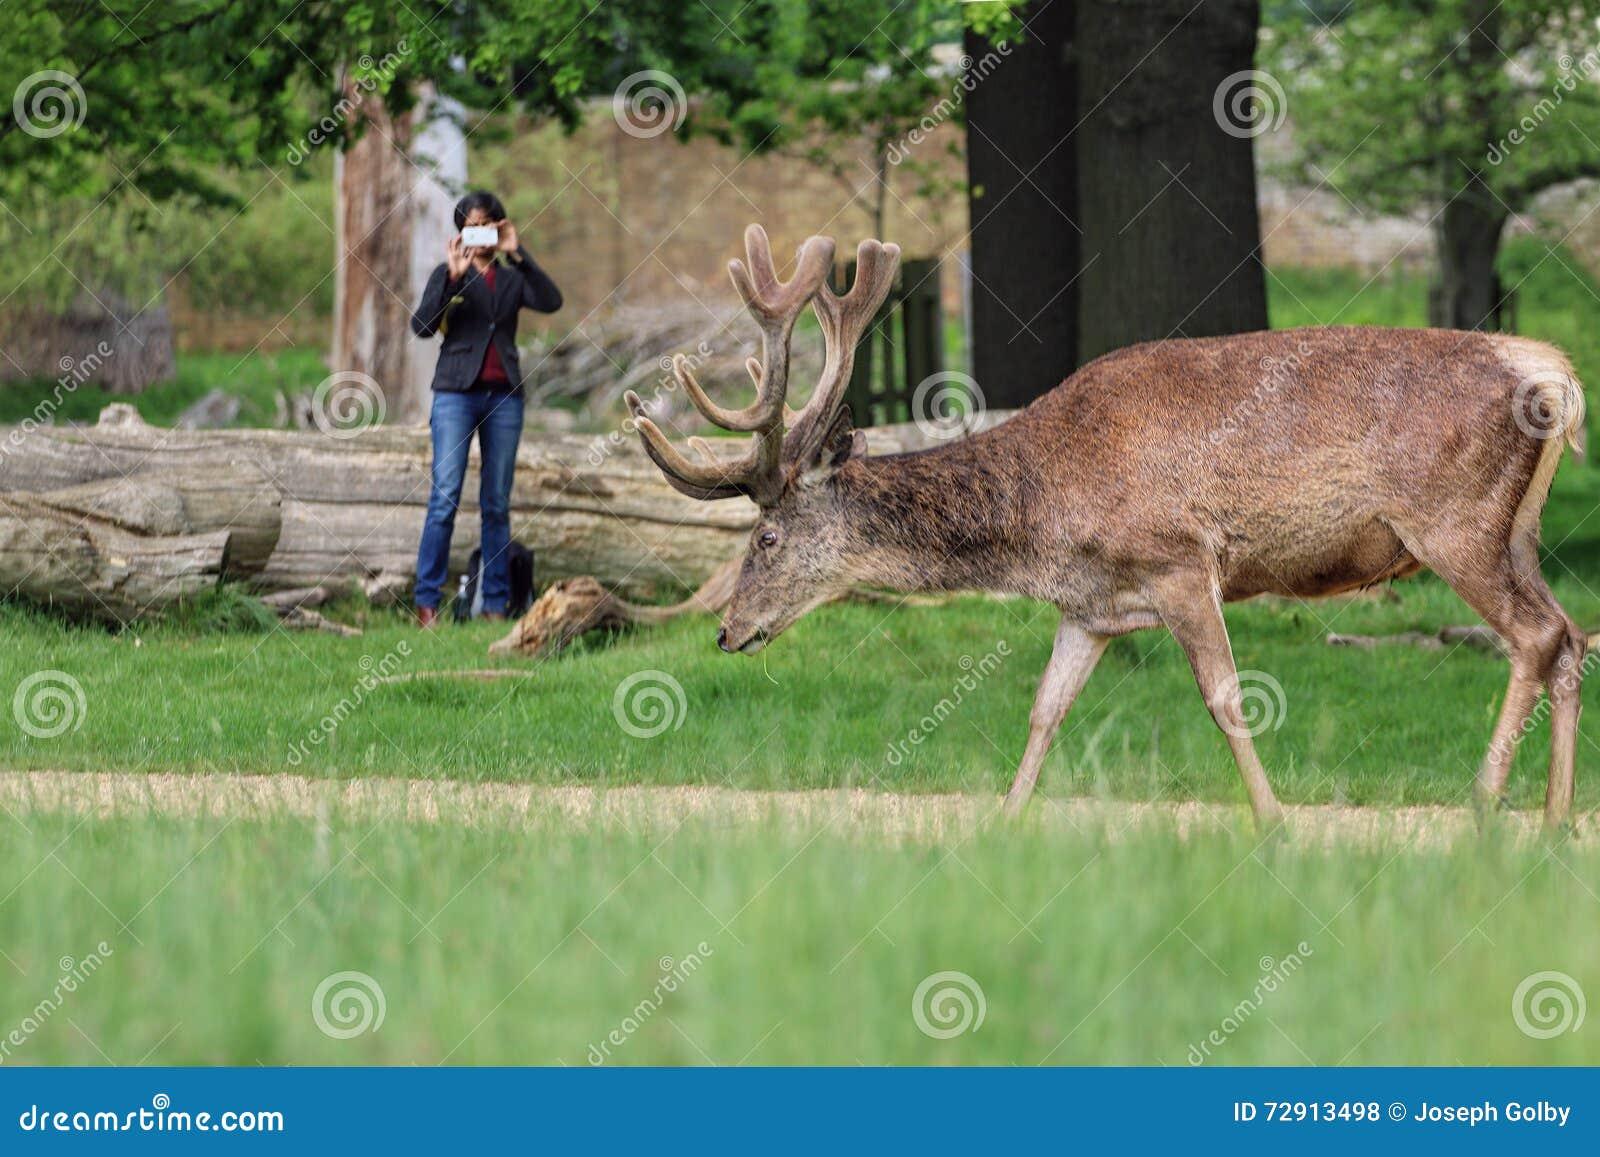 Woman takes photo of wild deer in park.